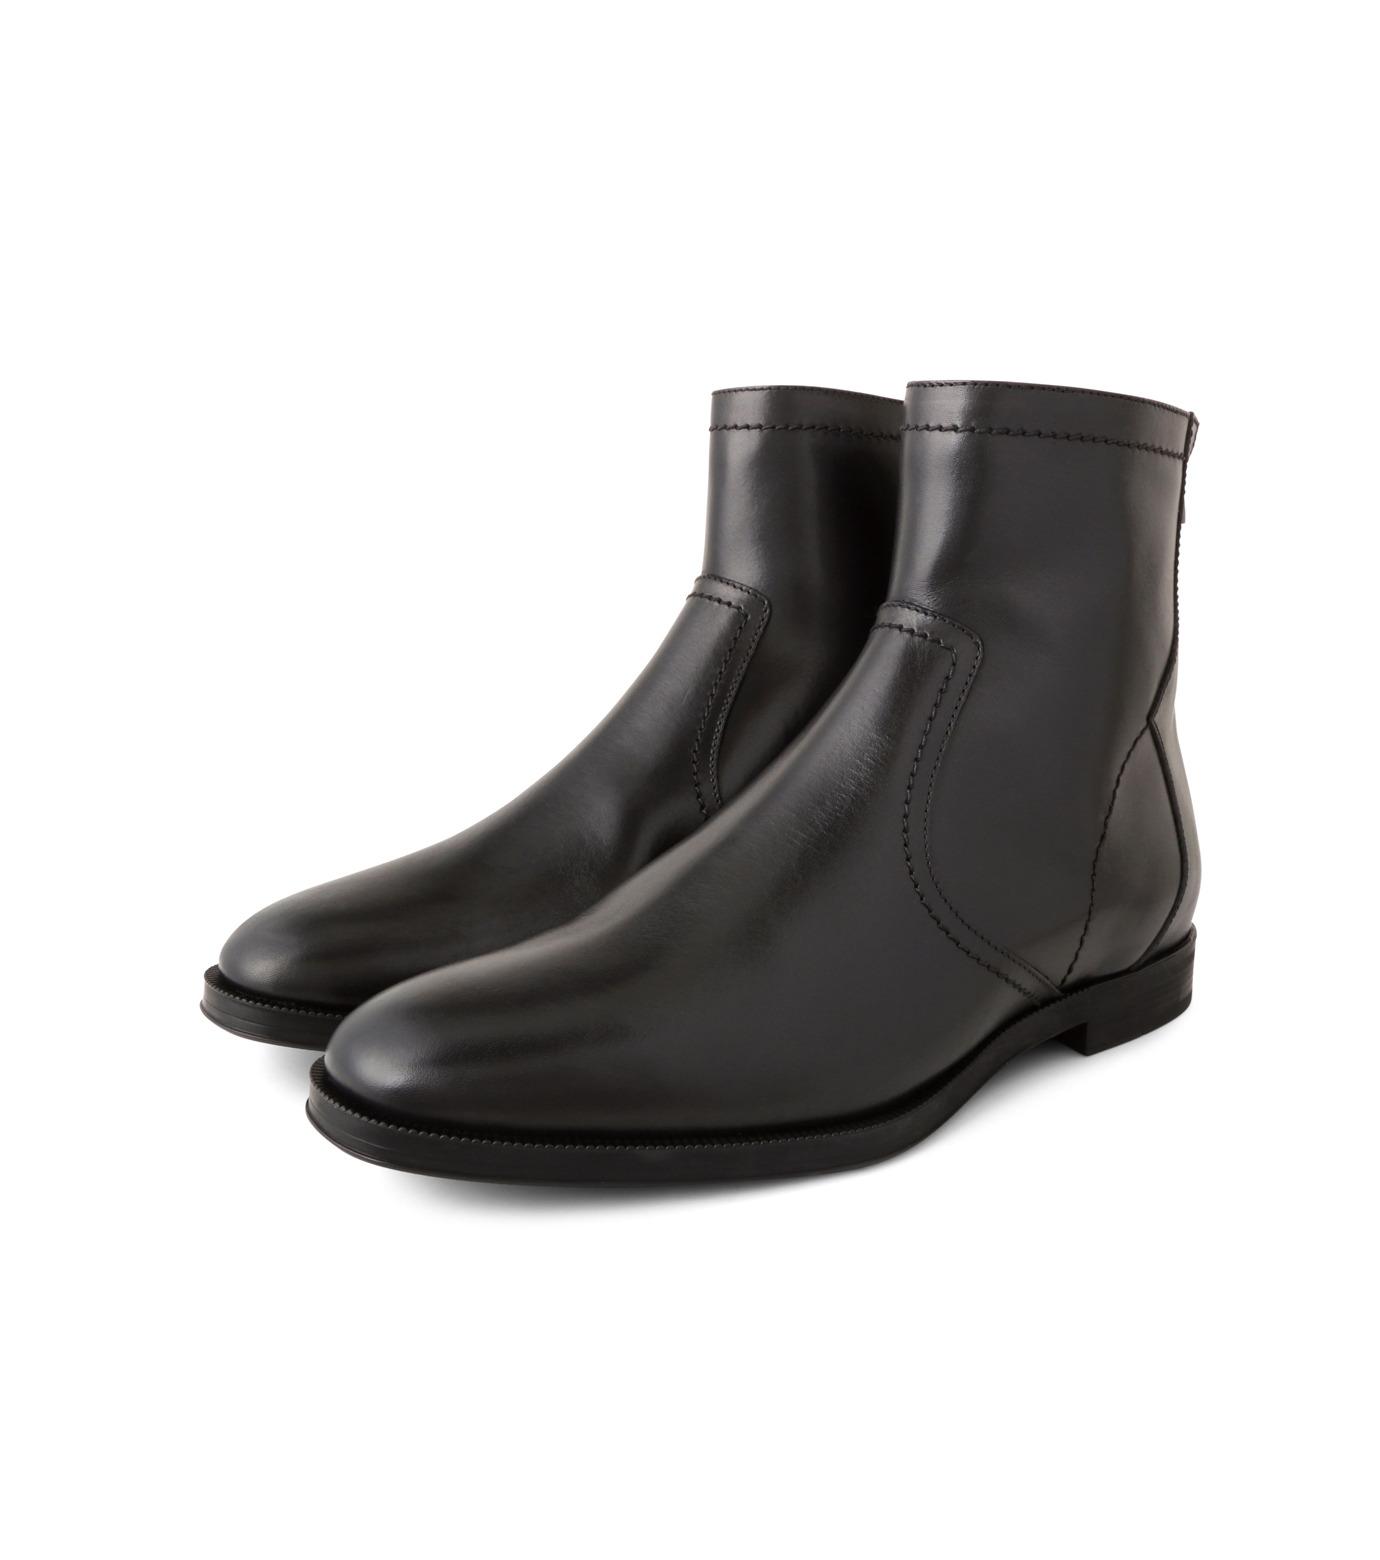 Jimmy Choo(ジミーチュウ)のMouton Boots-BLACK(ブーツ/boots)-PABLO-SVS-13 拡大詳細画像4